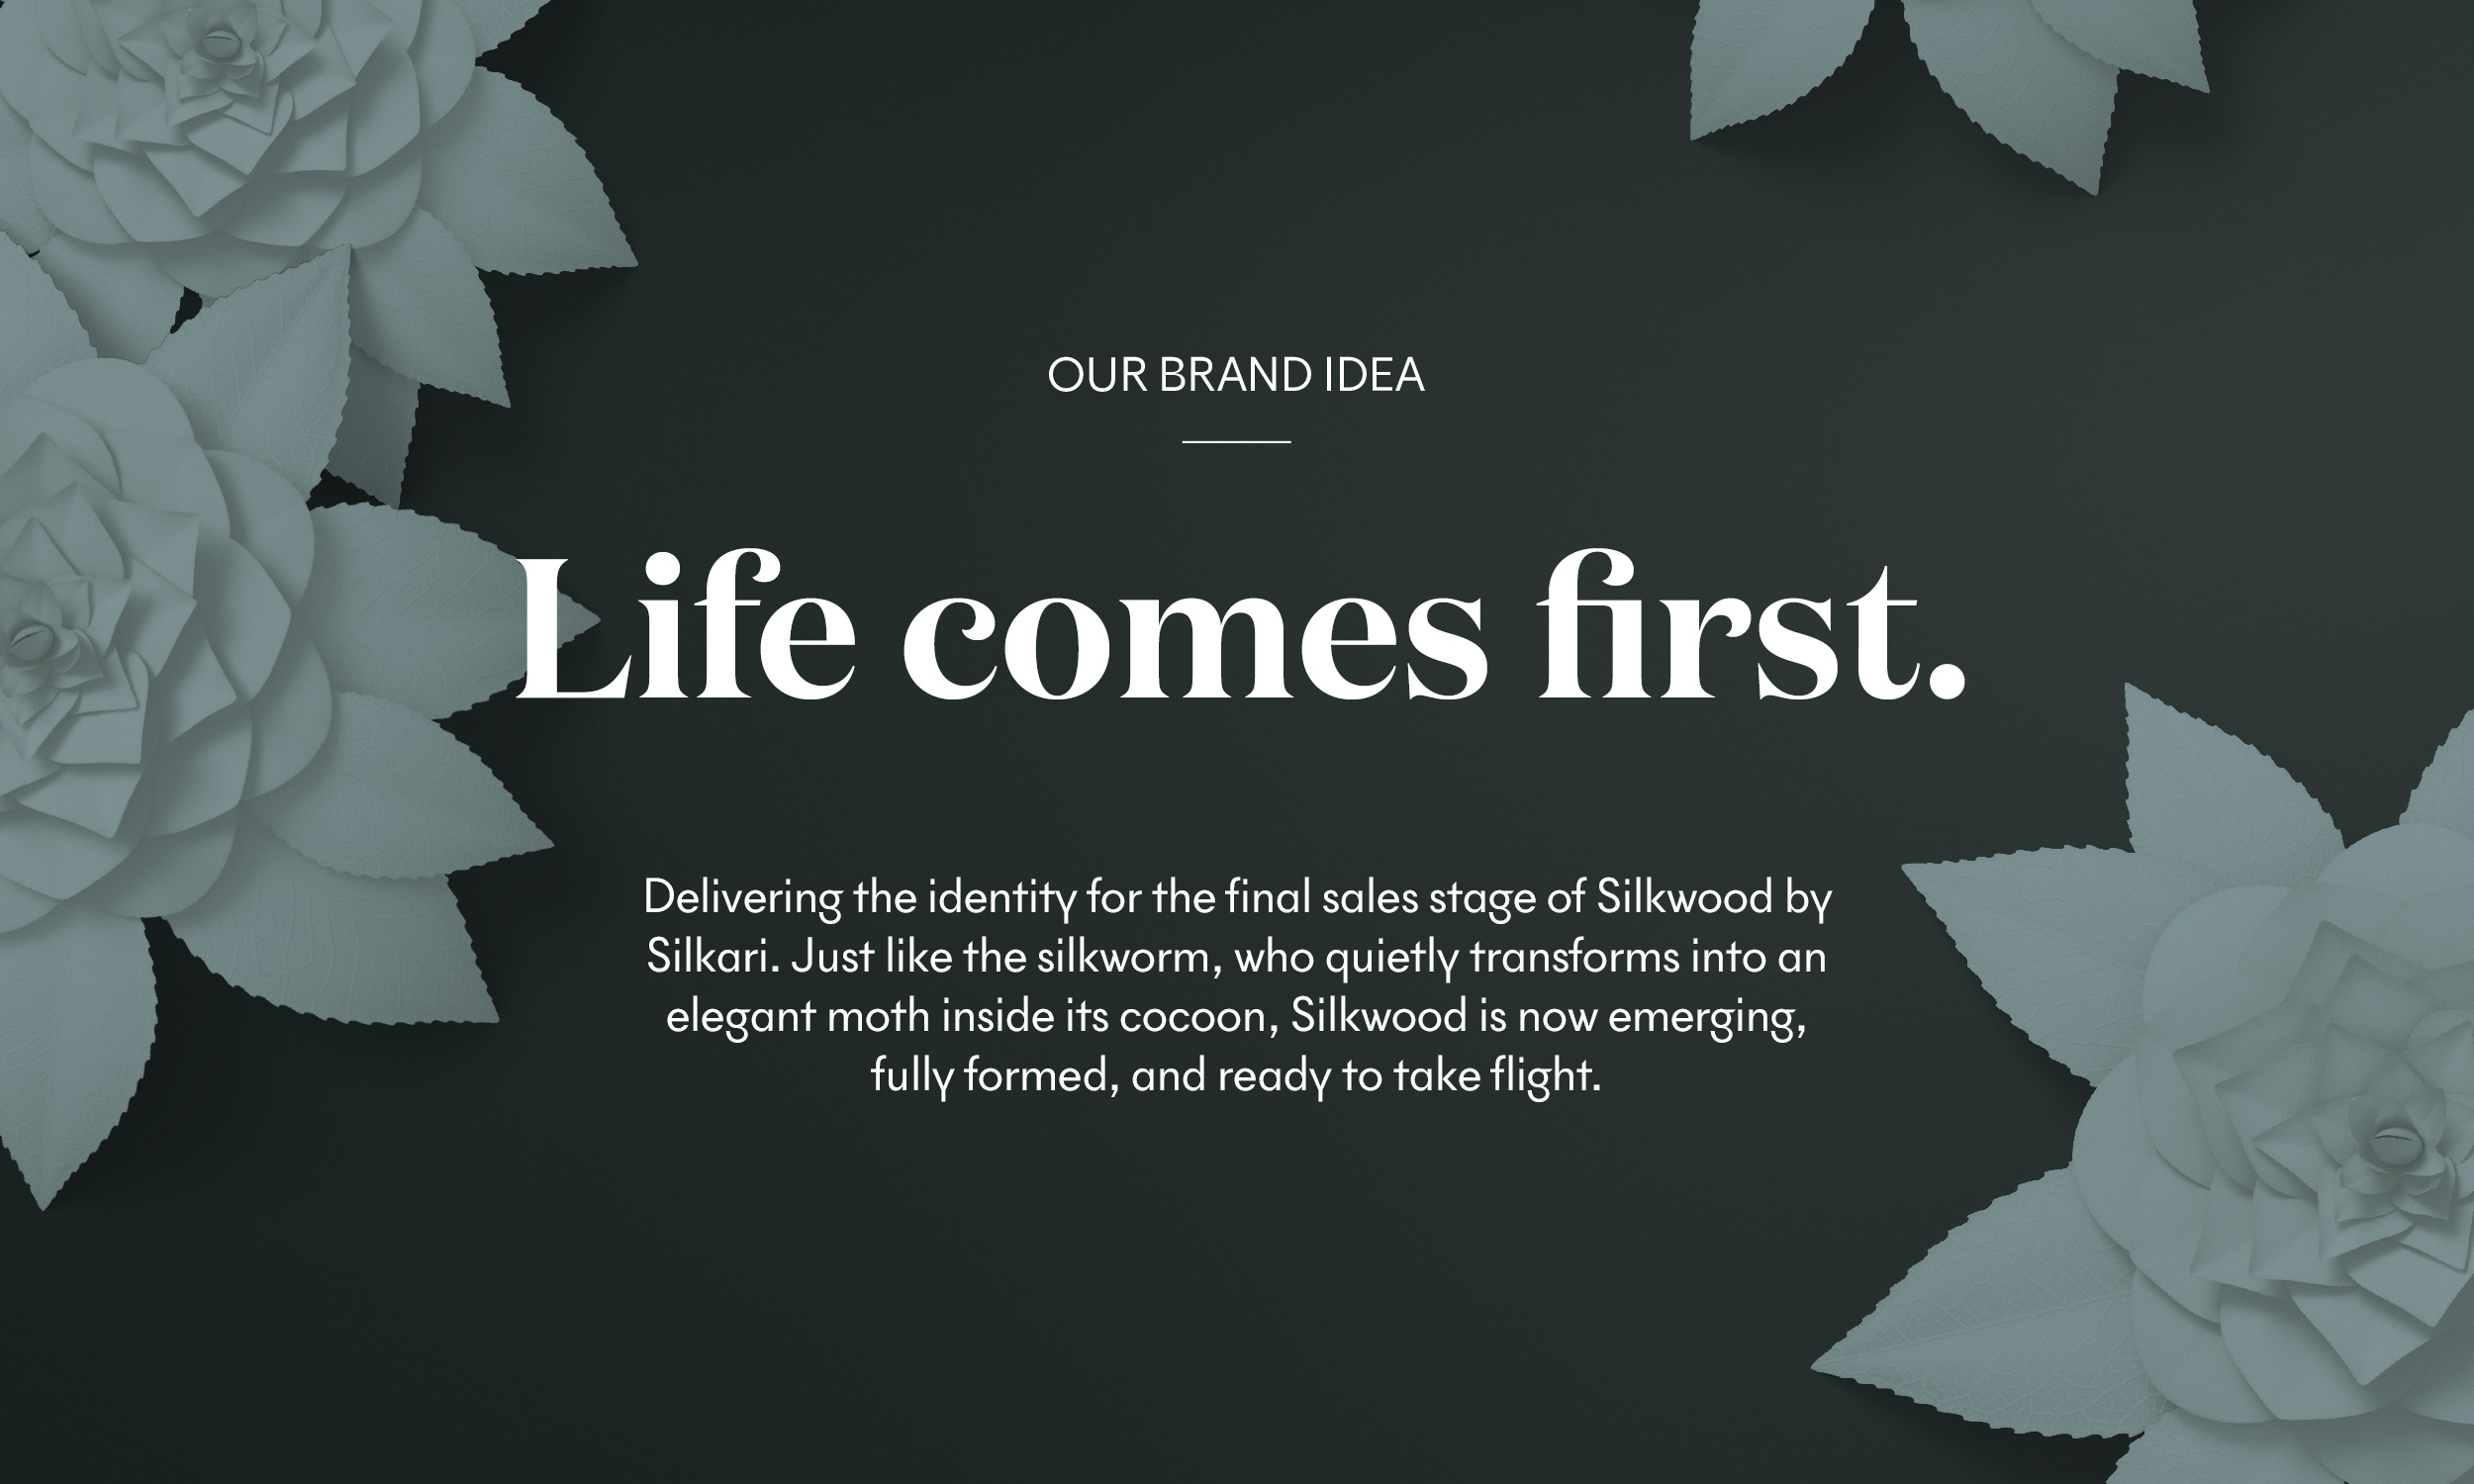 TNG-silkwood-brand-idea.jpg